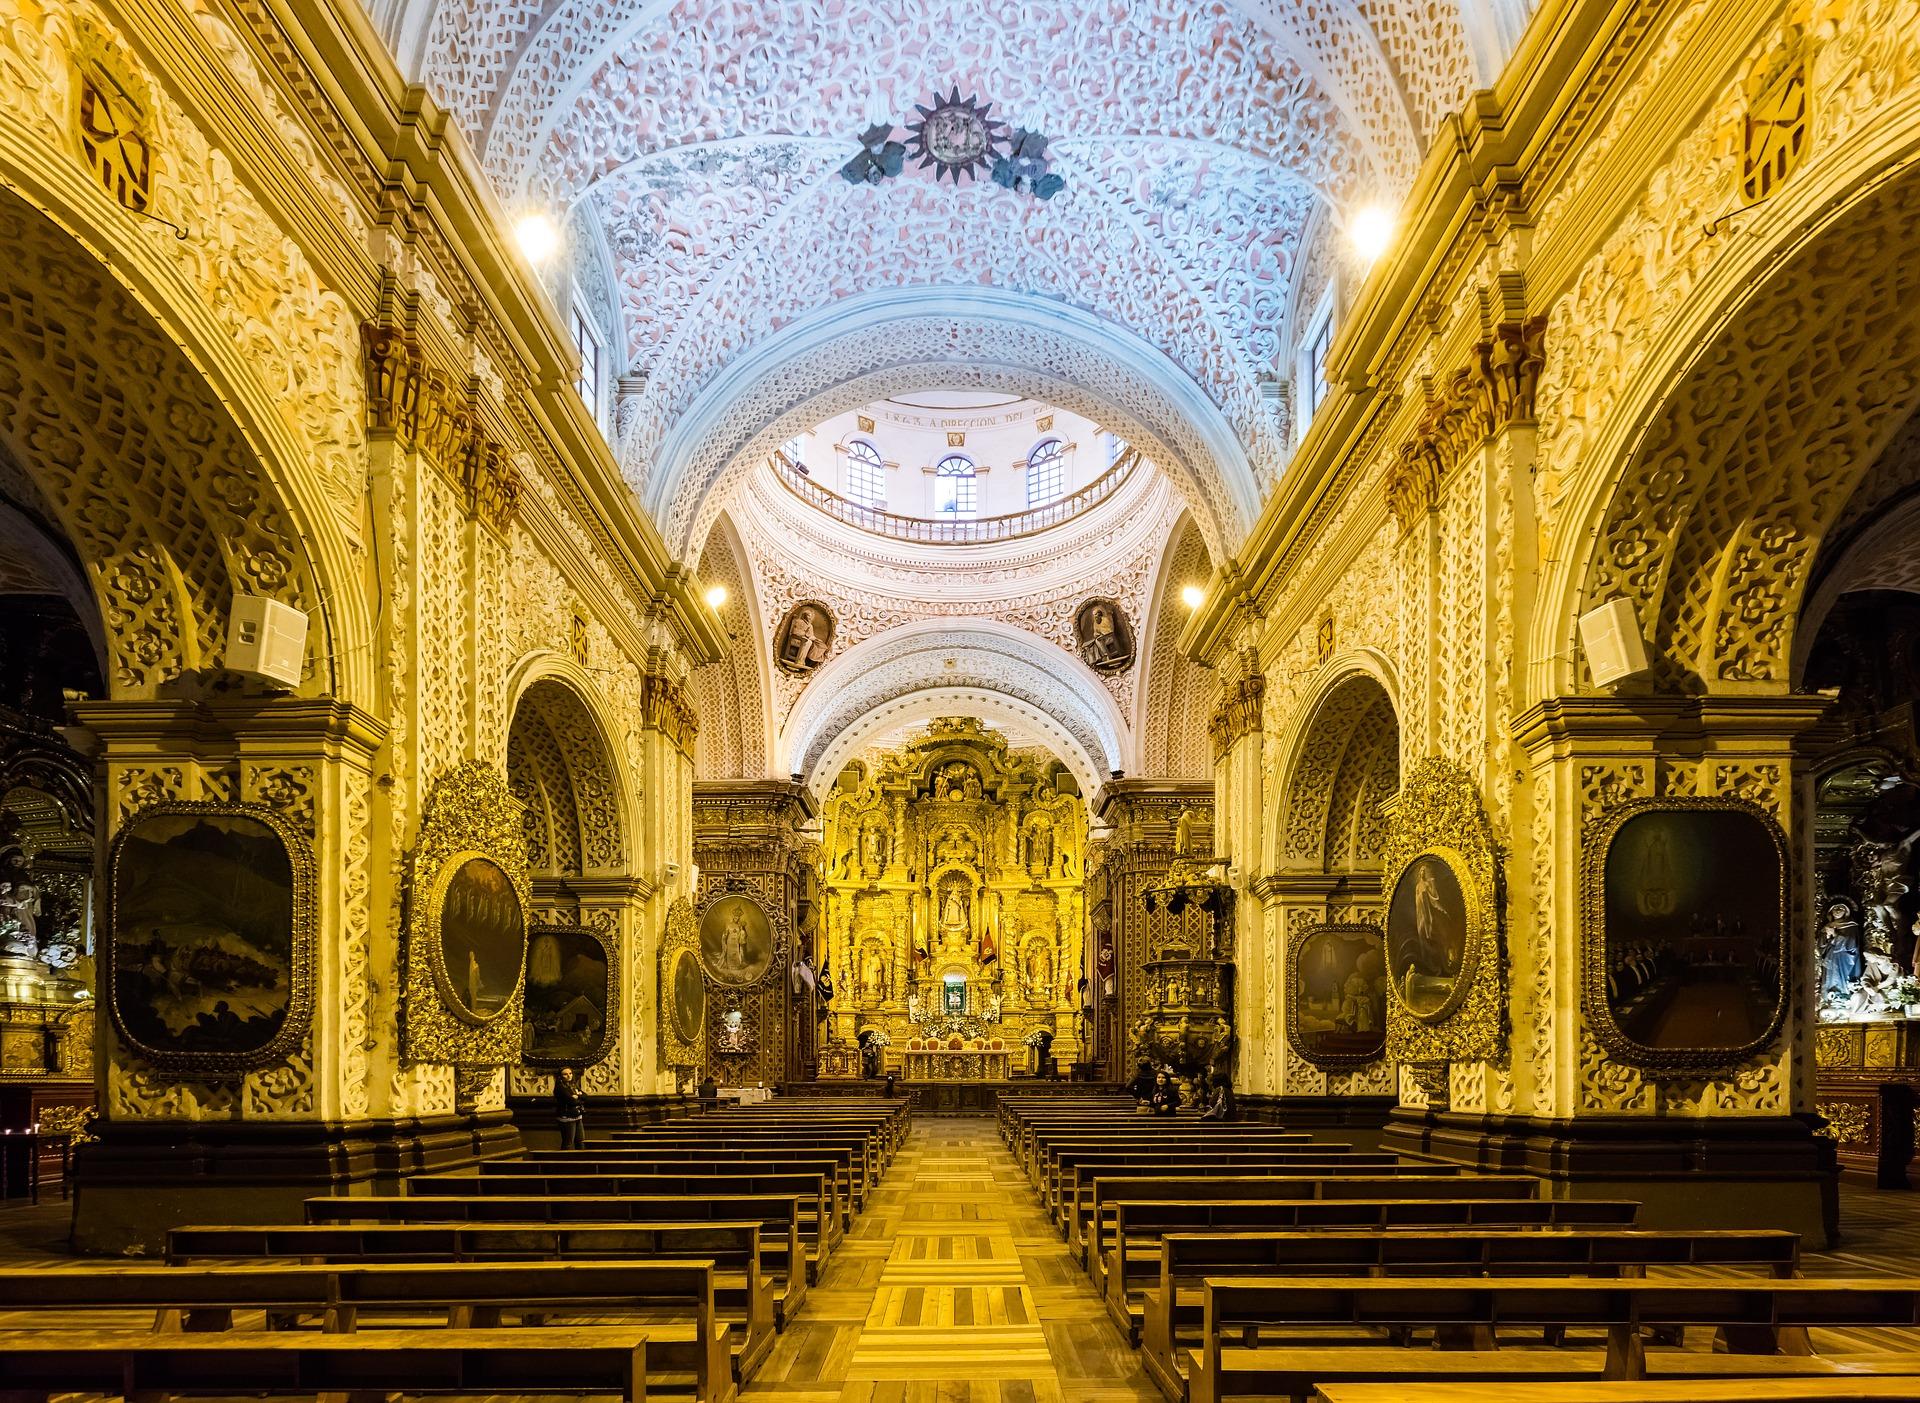 church-the-worship-2038591_1920.jpg